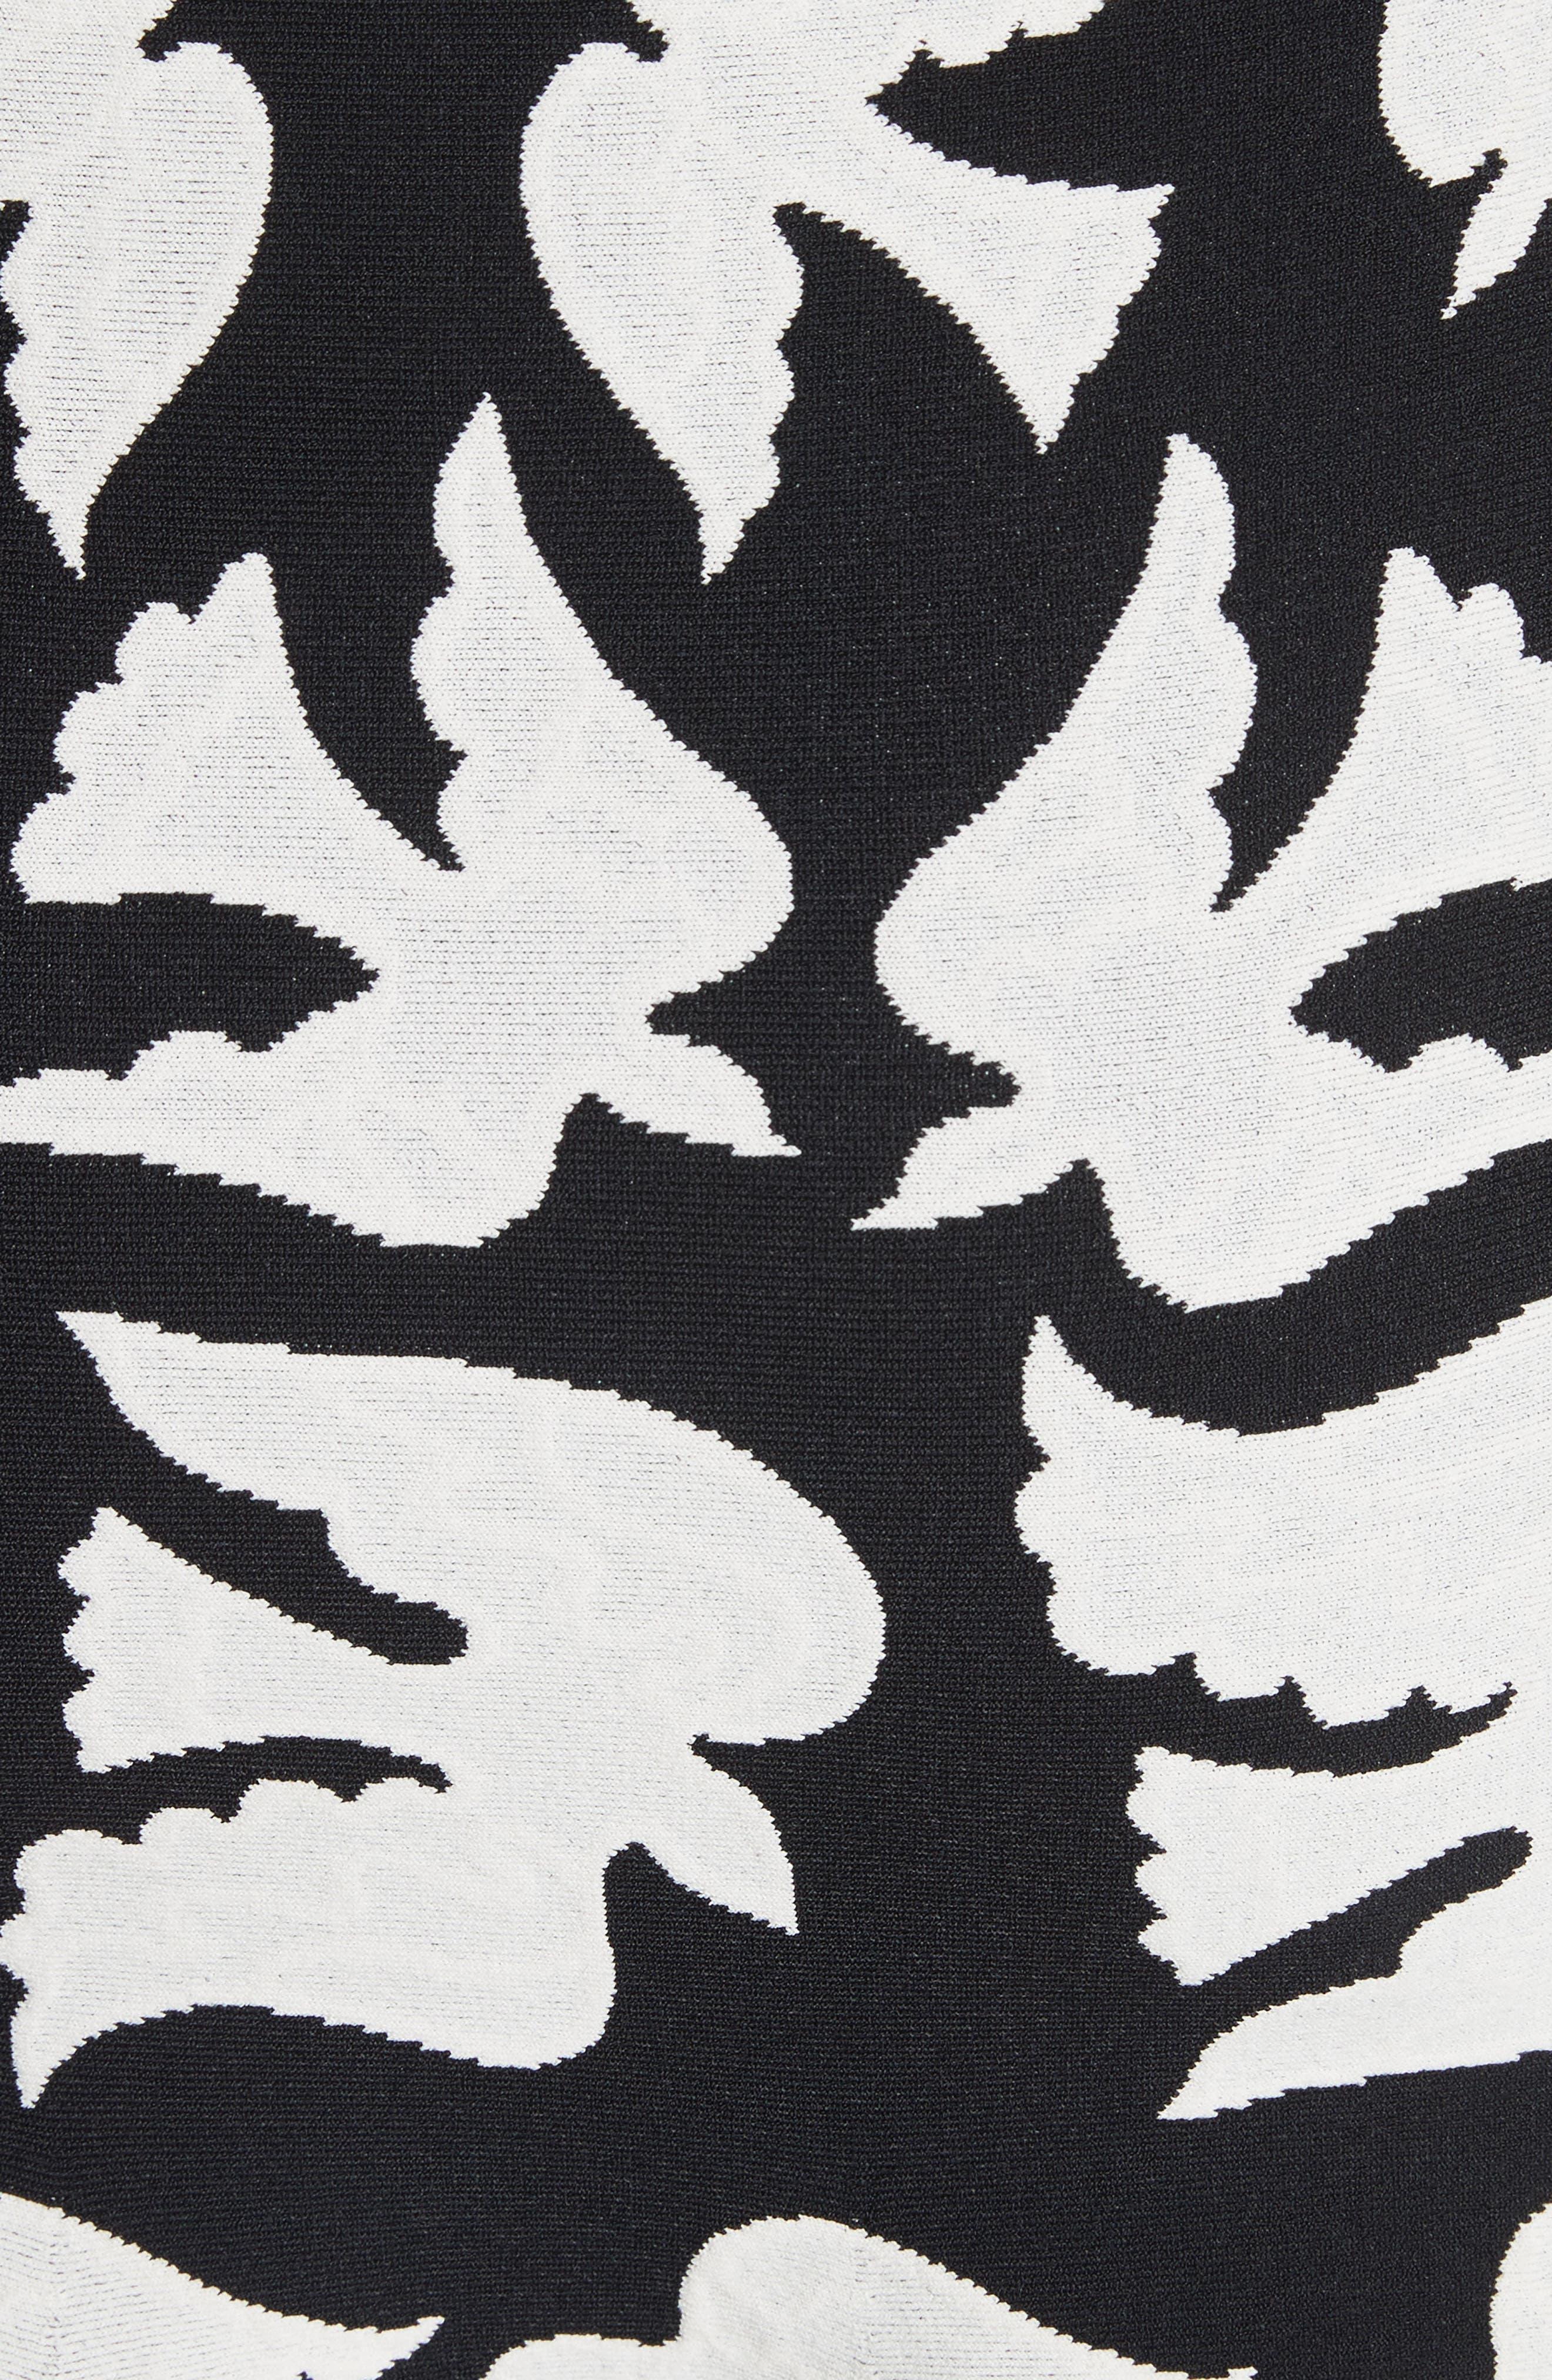 Bicolor Swallow Jacquard Dress,                             Alternate thumbnail 5, color,                             001